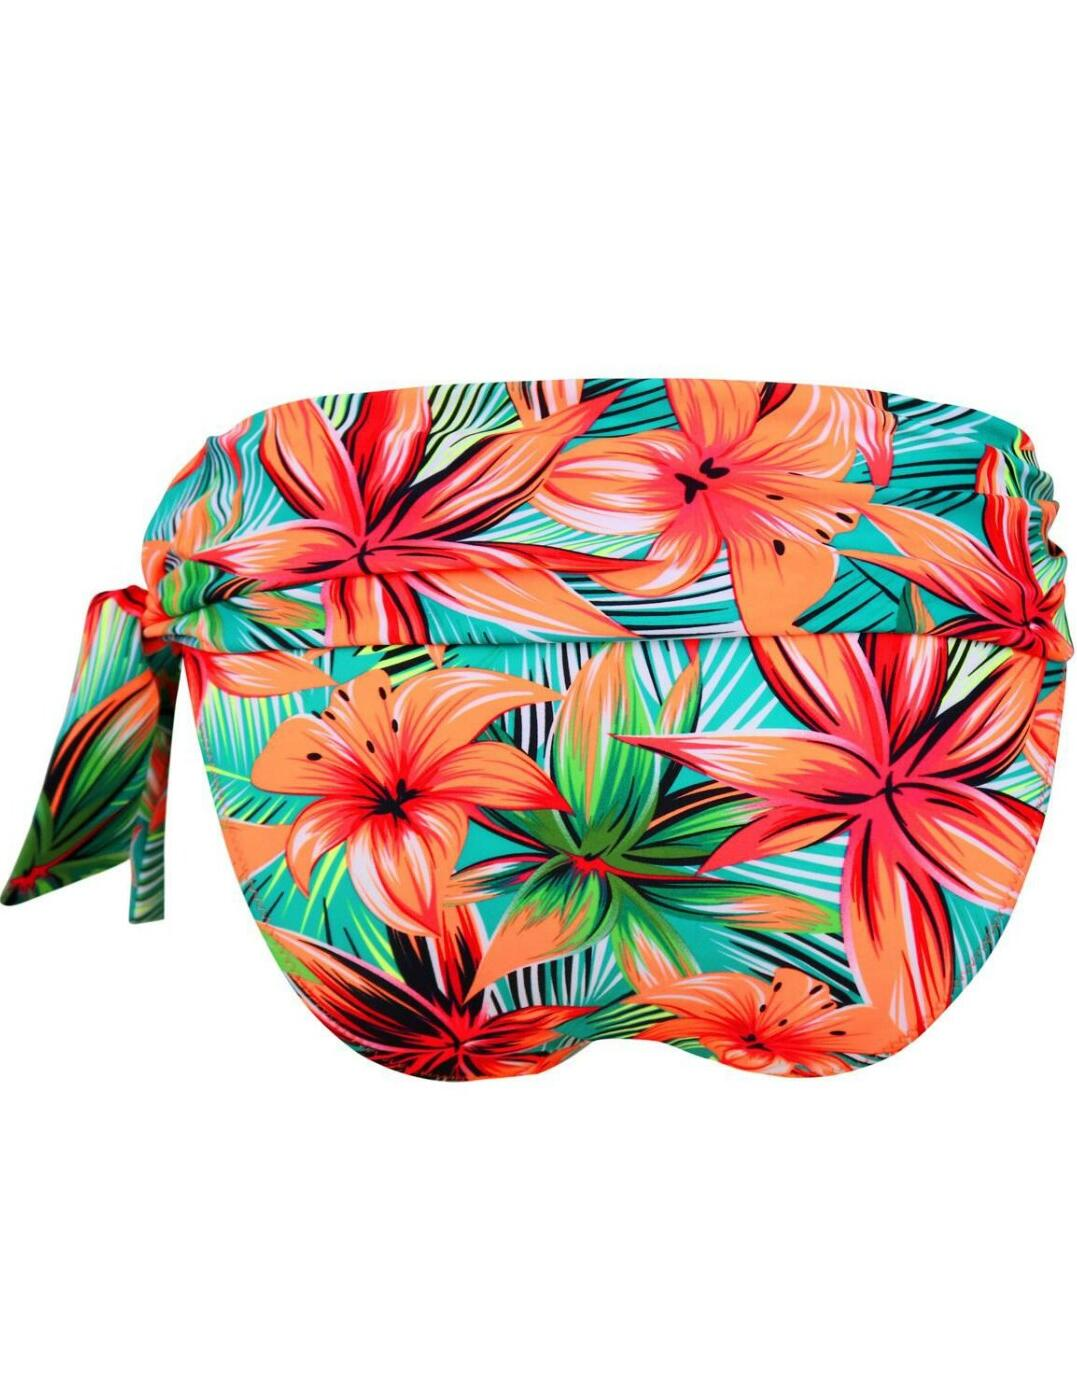 Pour-Moi-Heatwave-Fold-Over-Bikini-Brief-Bottoms-86003-New-Womens-Swimwear thumbnail 10